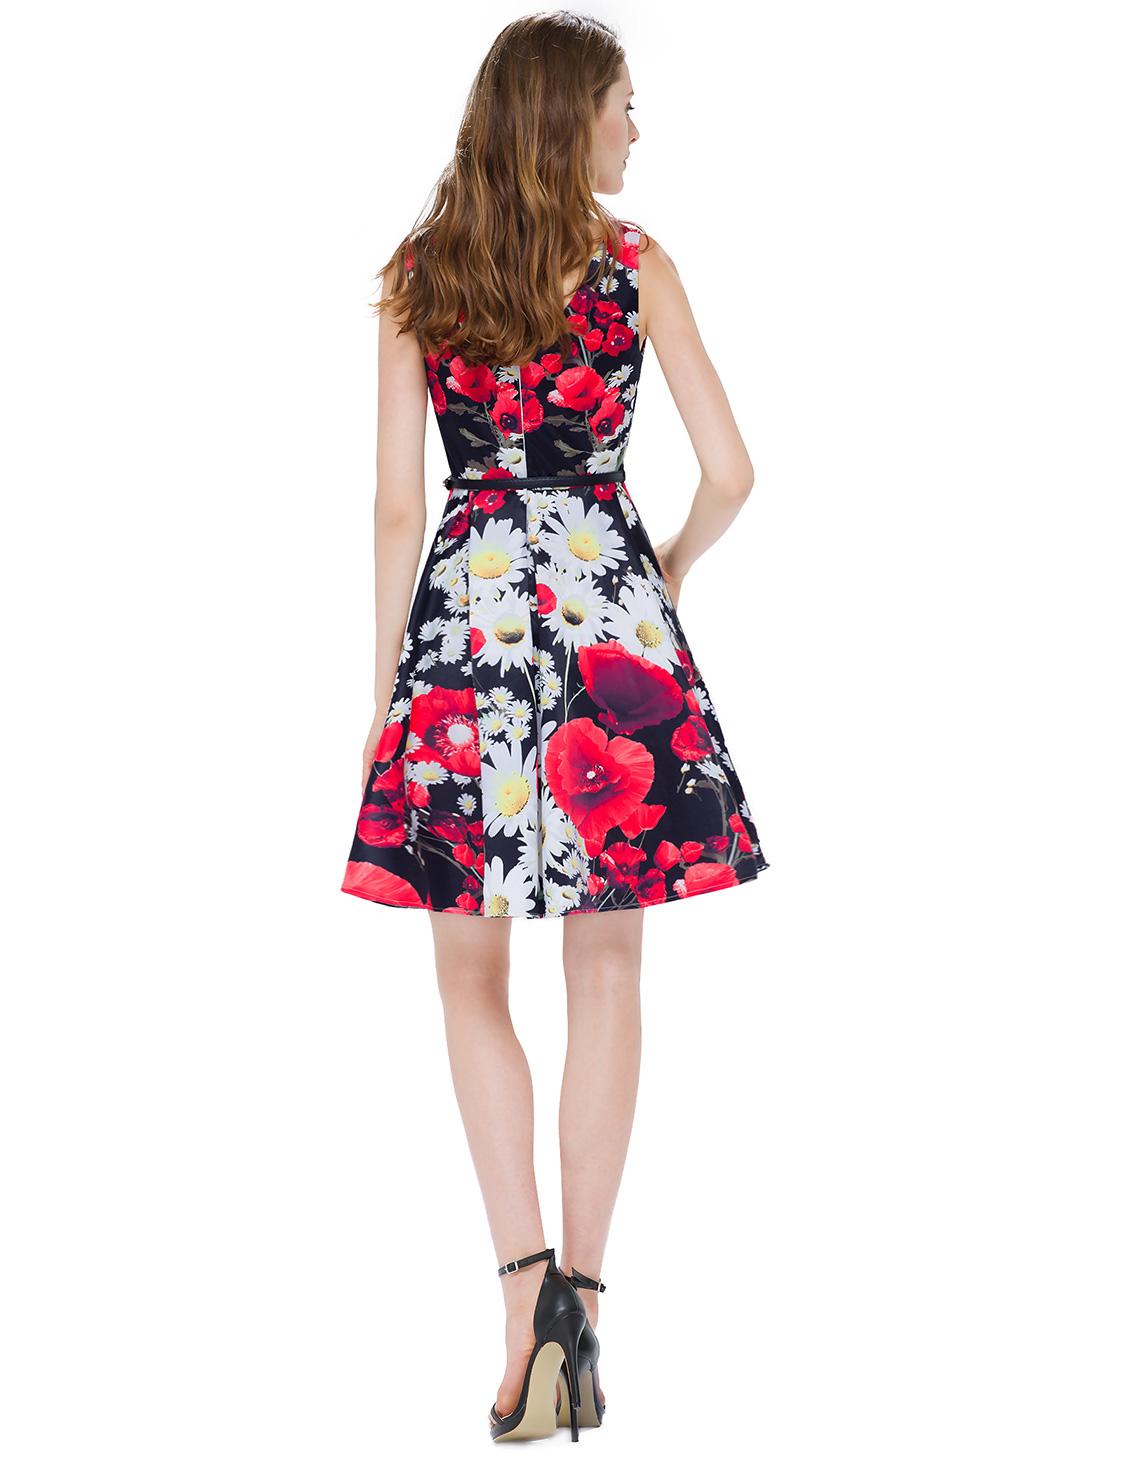 Alisa-Pan-Summer-Dresses-Bohemian-Floral-Print-Sleeveless-Boho-Beach-Dress-05531